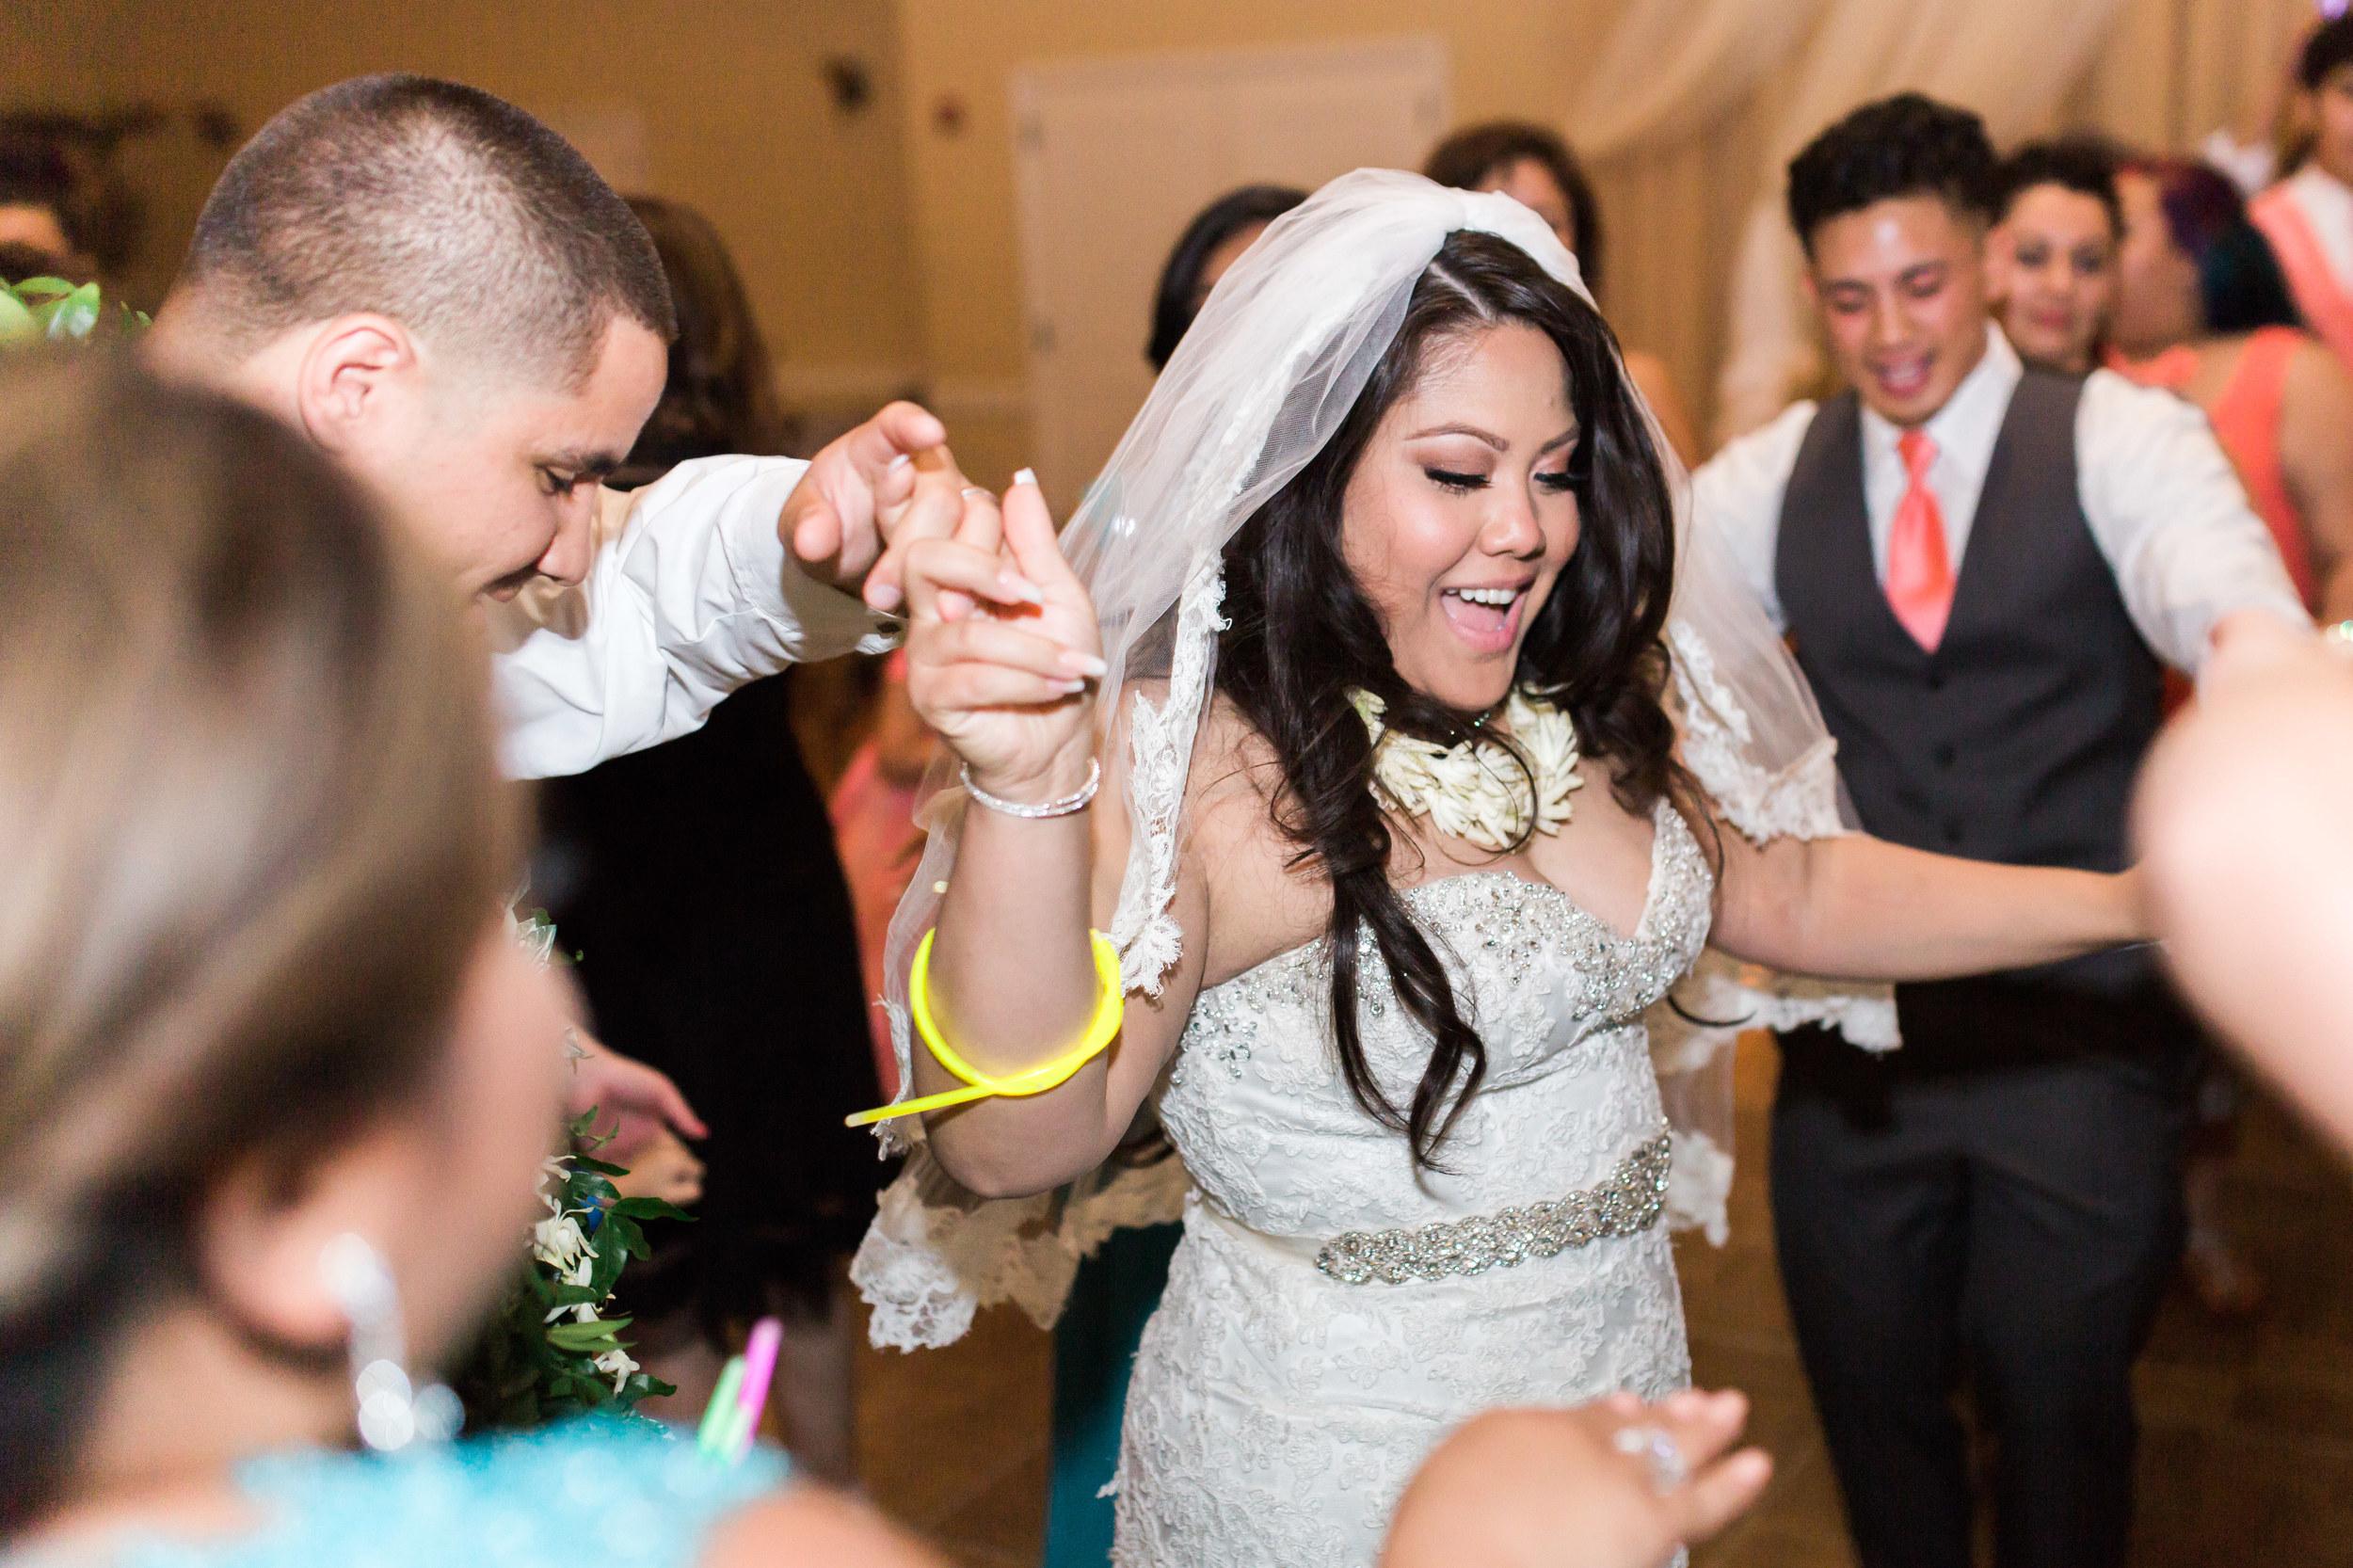 hawaiian-inspired-wedding-at-blackhawk-country-club-3846.jpg